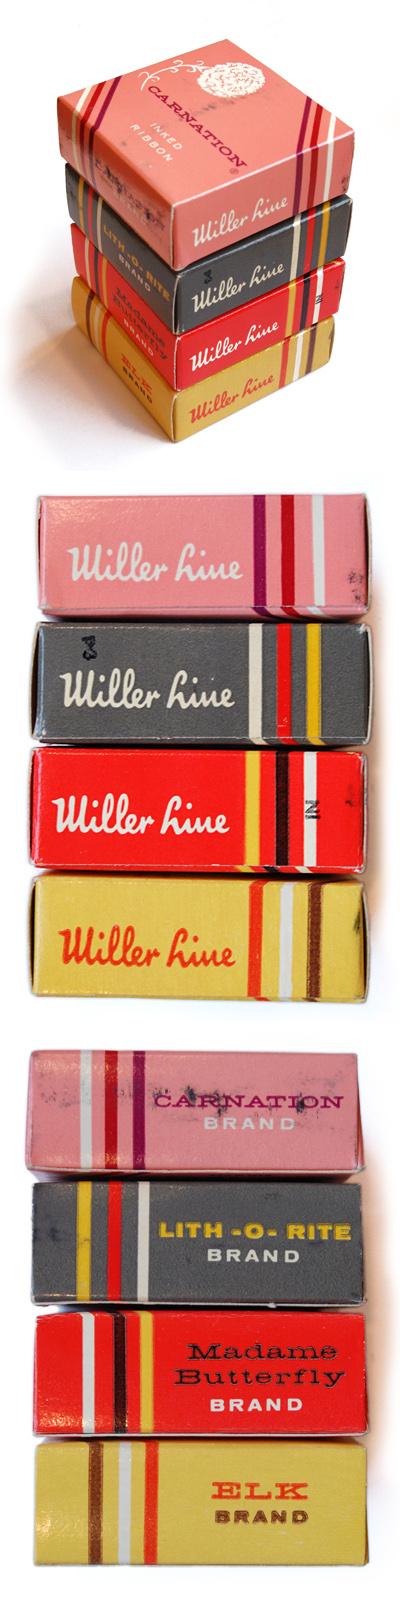 ribbonboxes